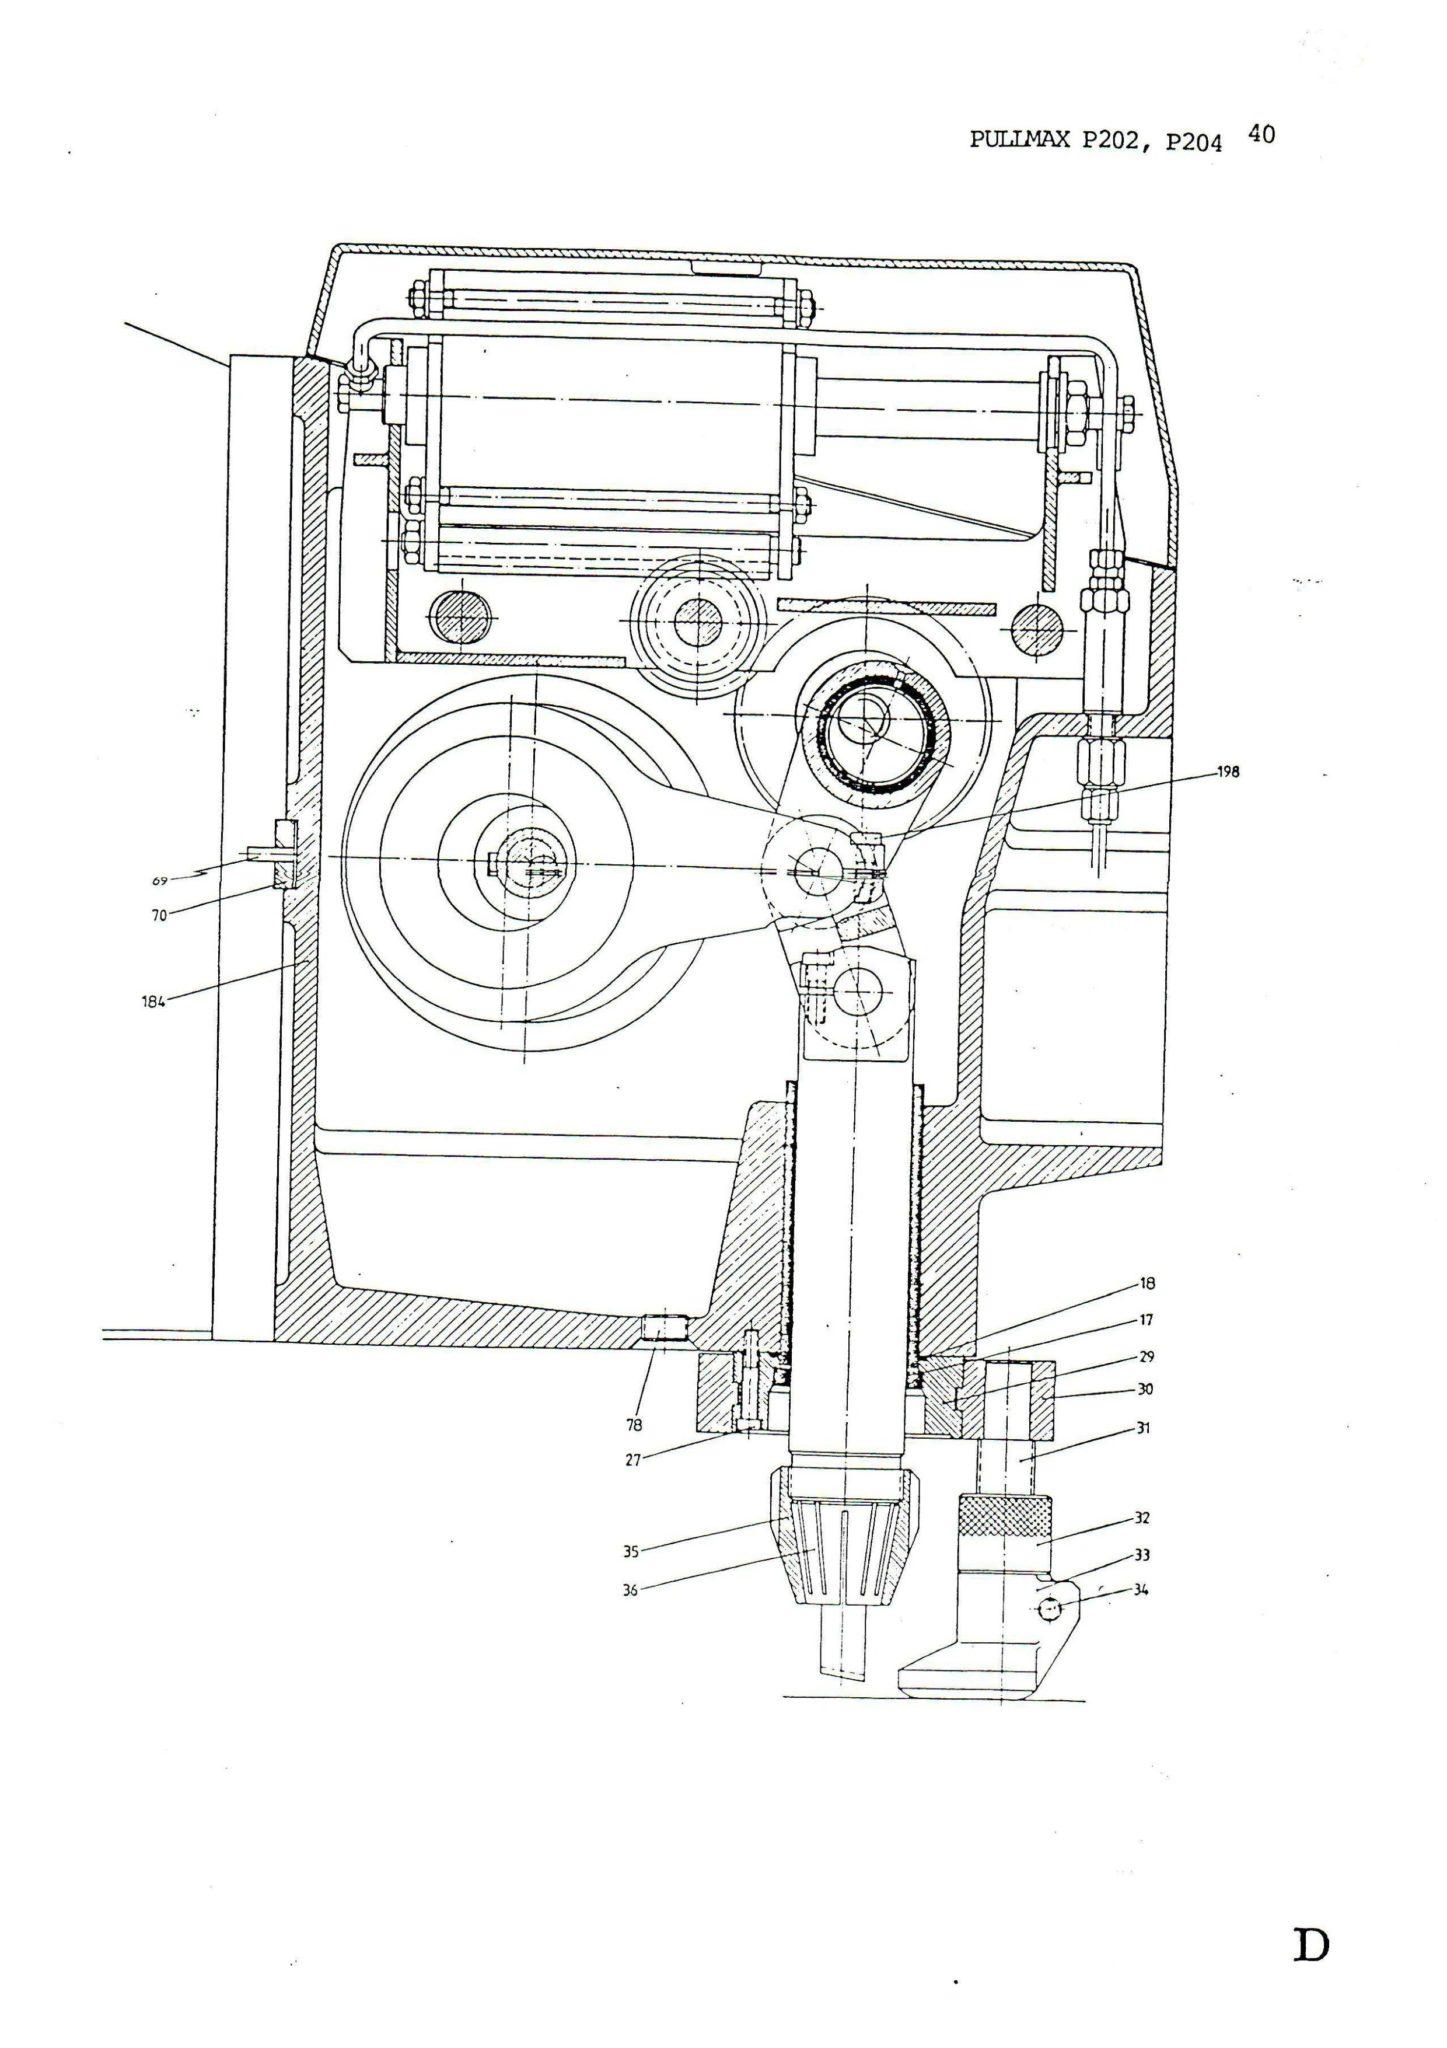 Manuel d'utilisation Pullmax P201